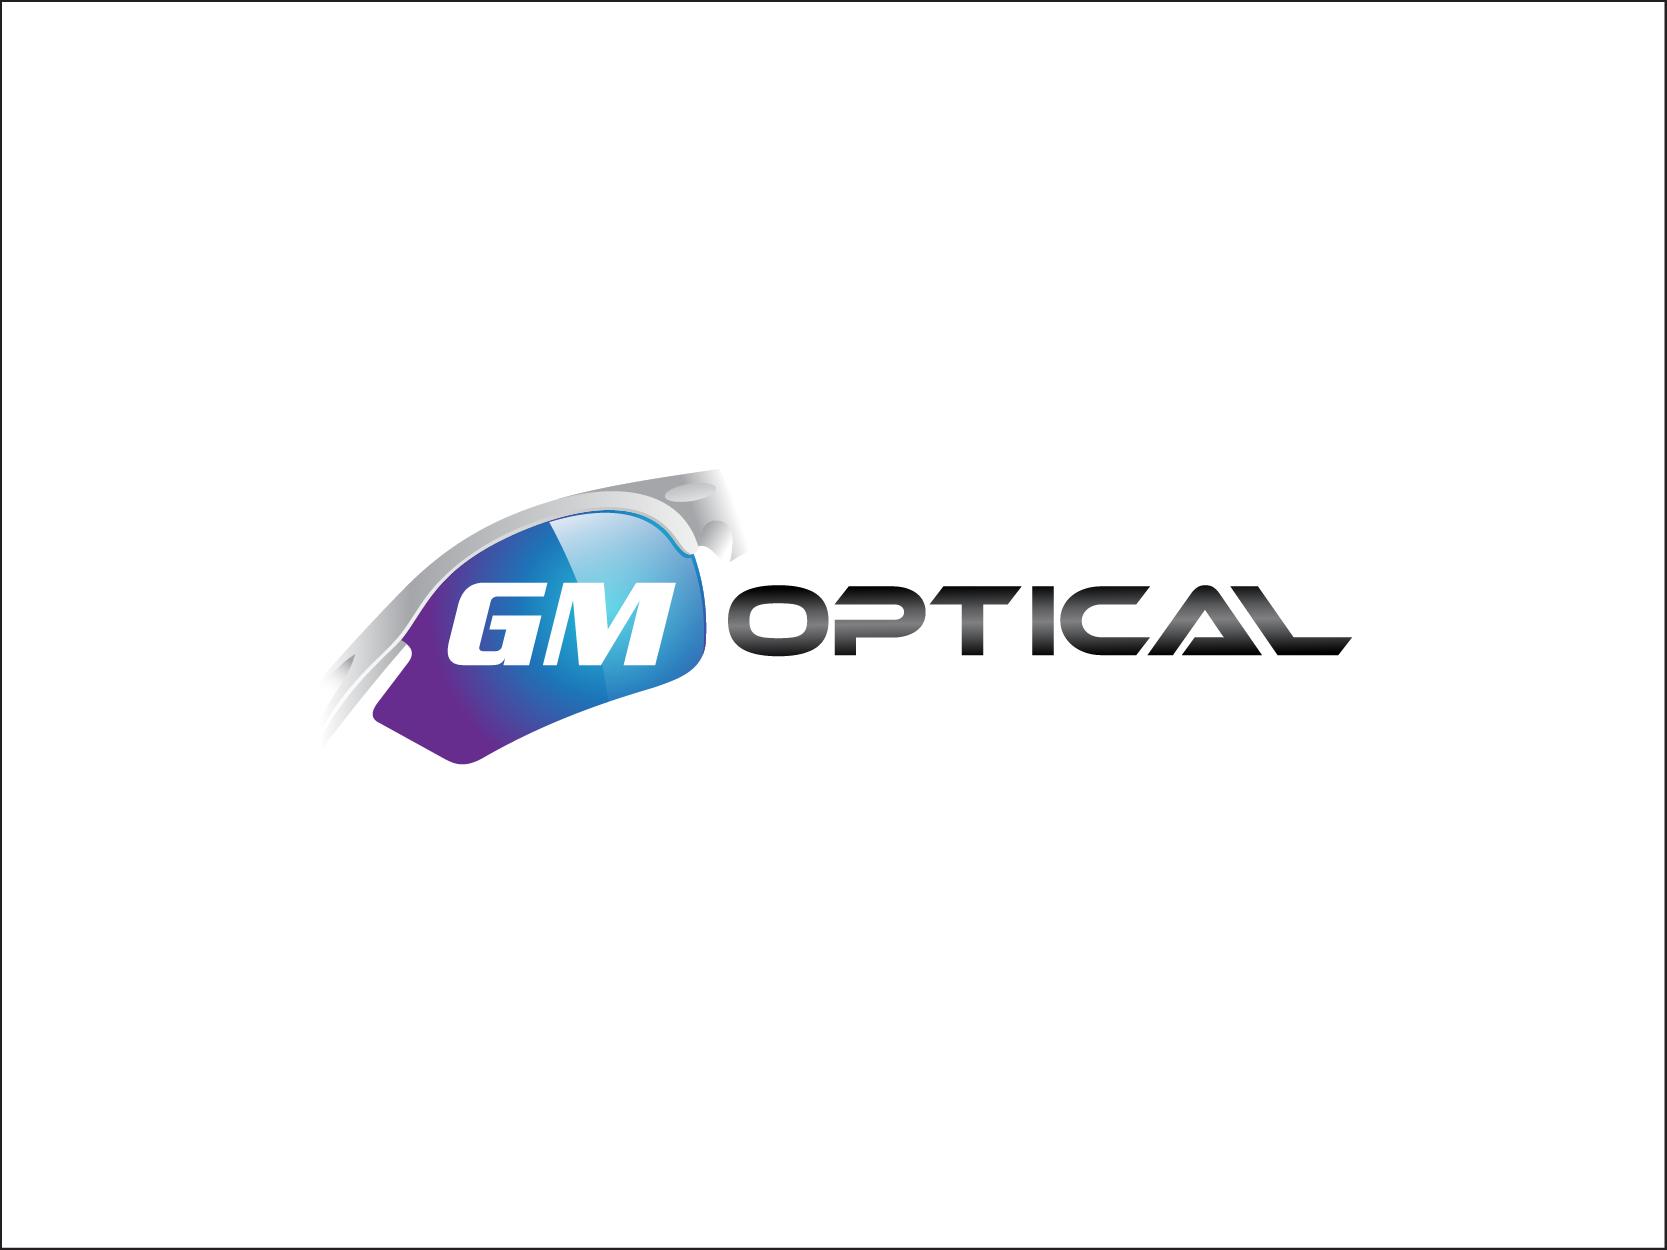 Quality high tech prescription sports optics company needs your help